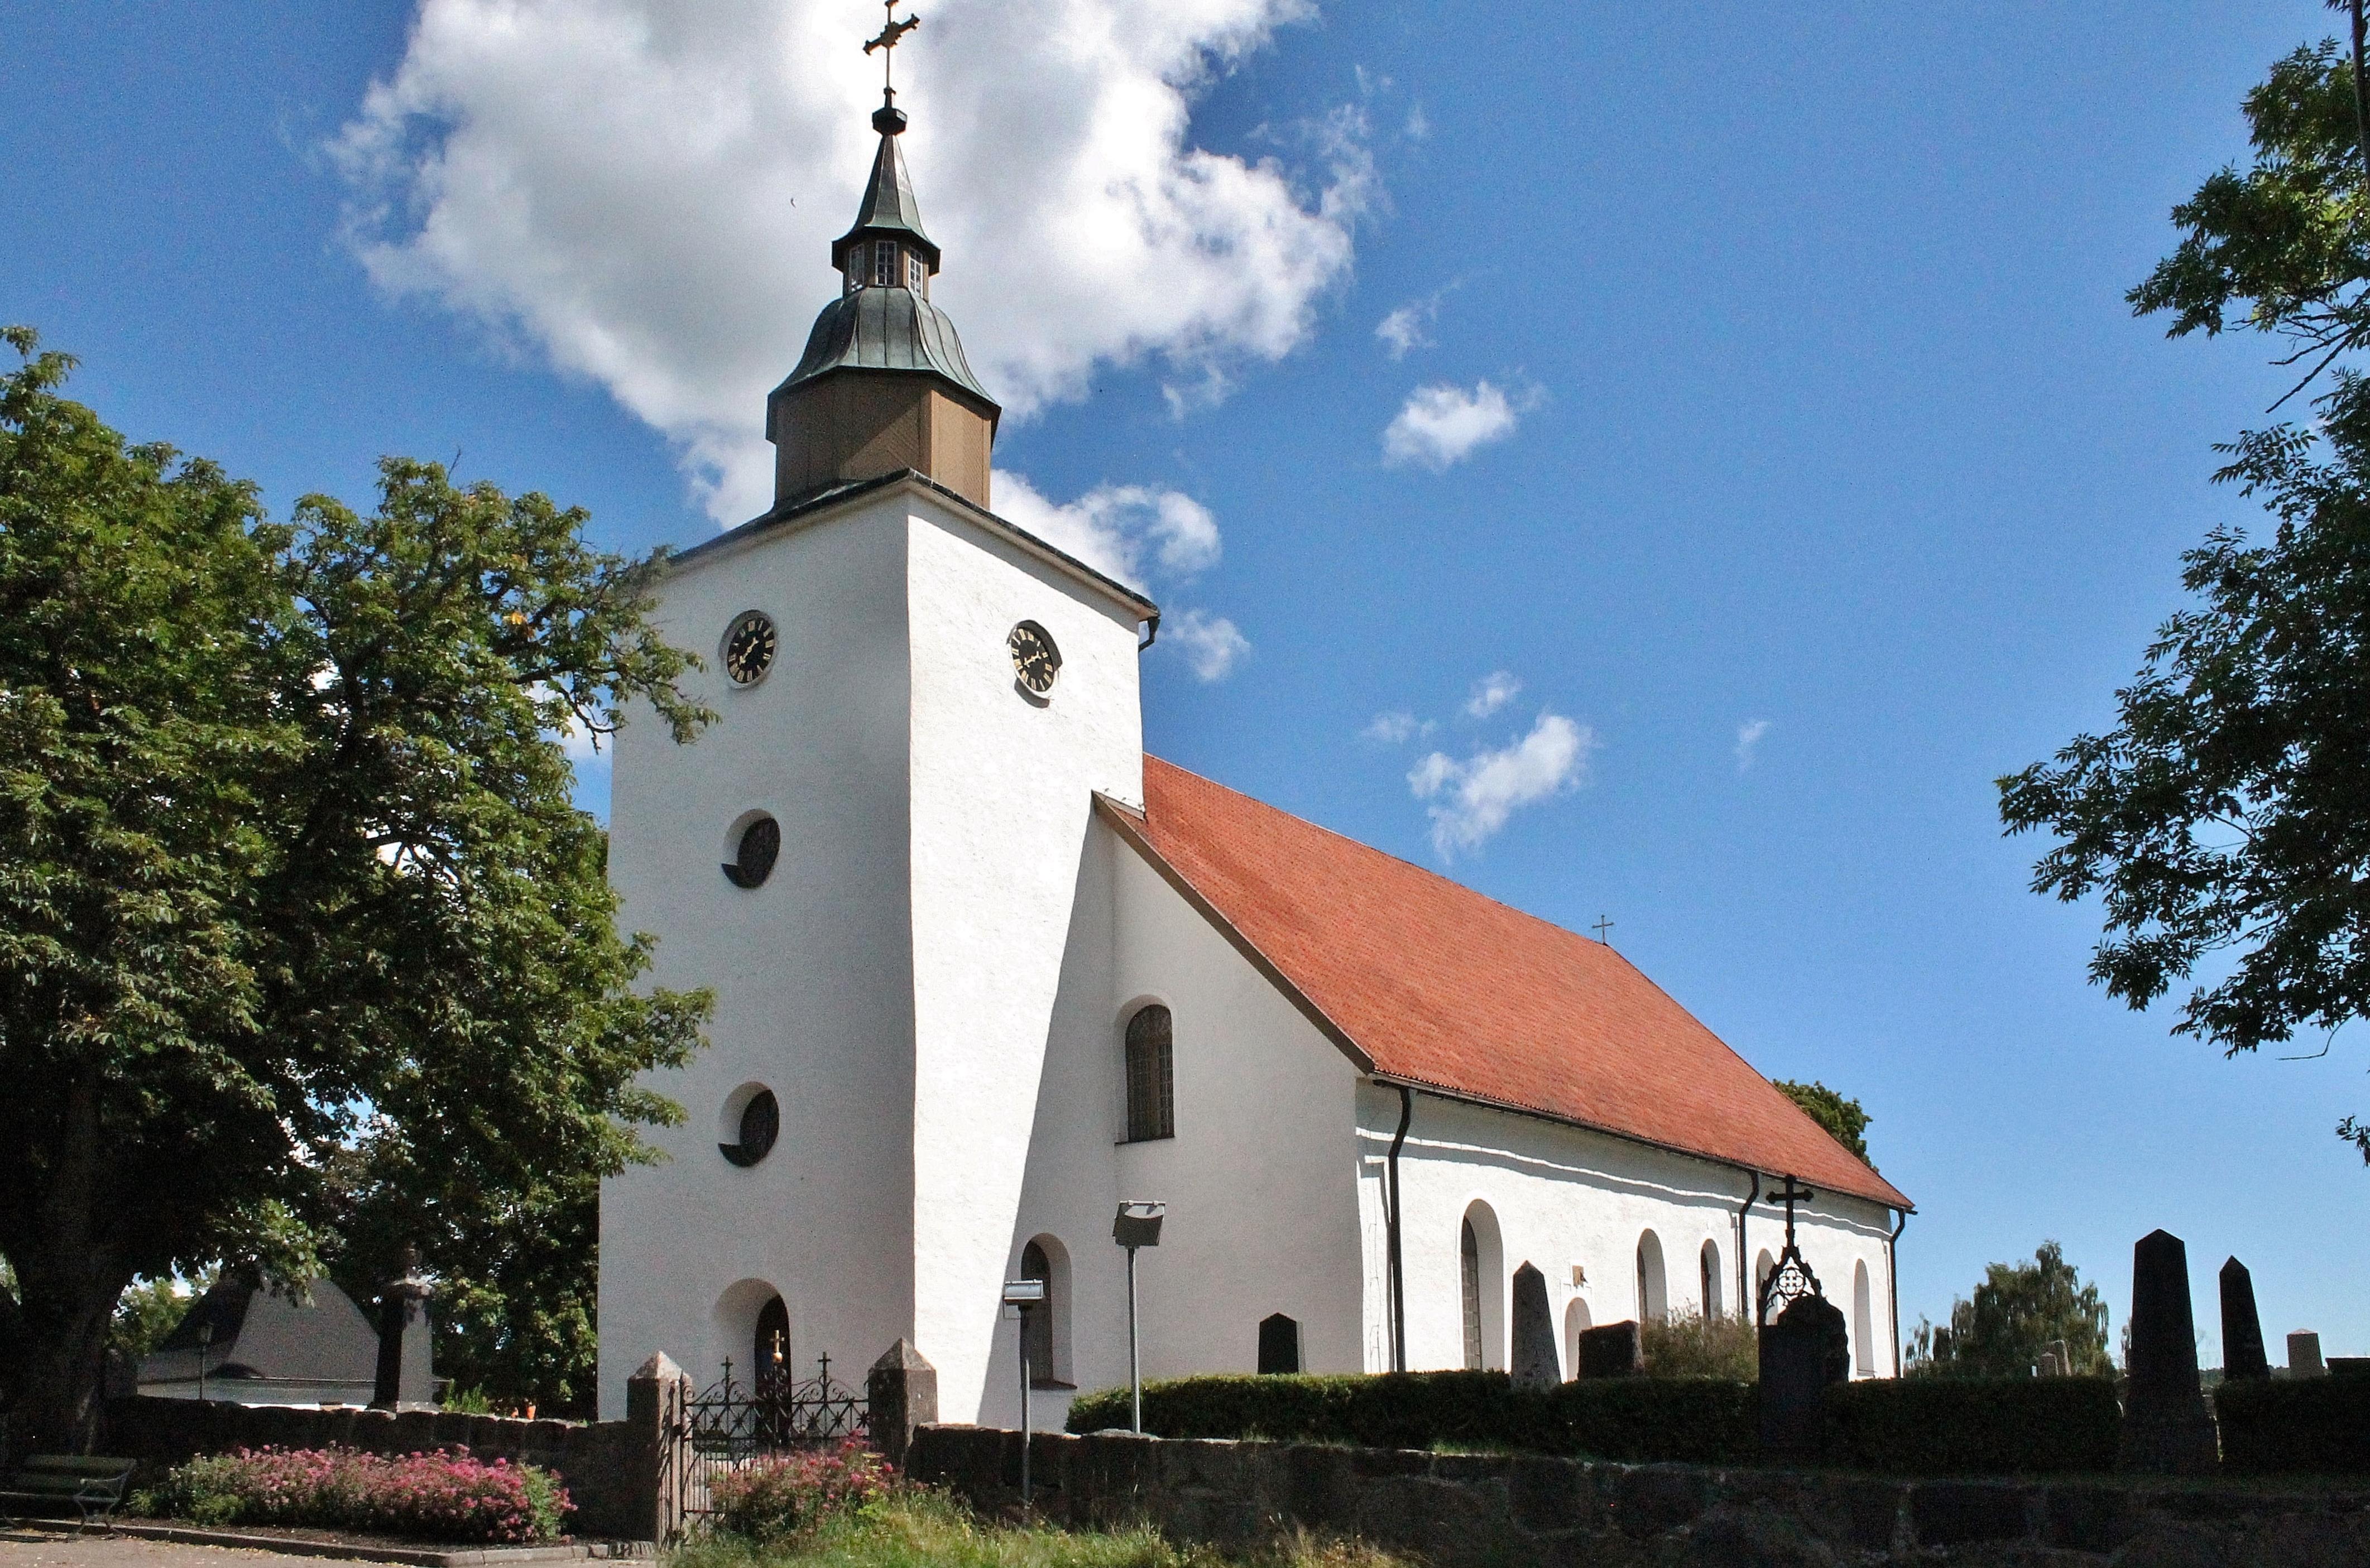 Dderhult kyrkogrd in Doderhult, Kalmar ln - Find A Grave